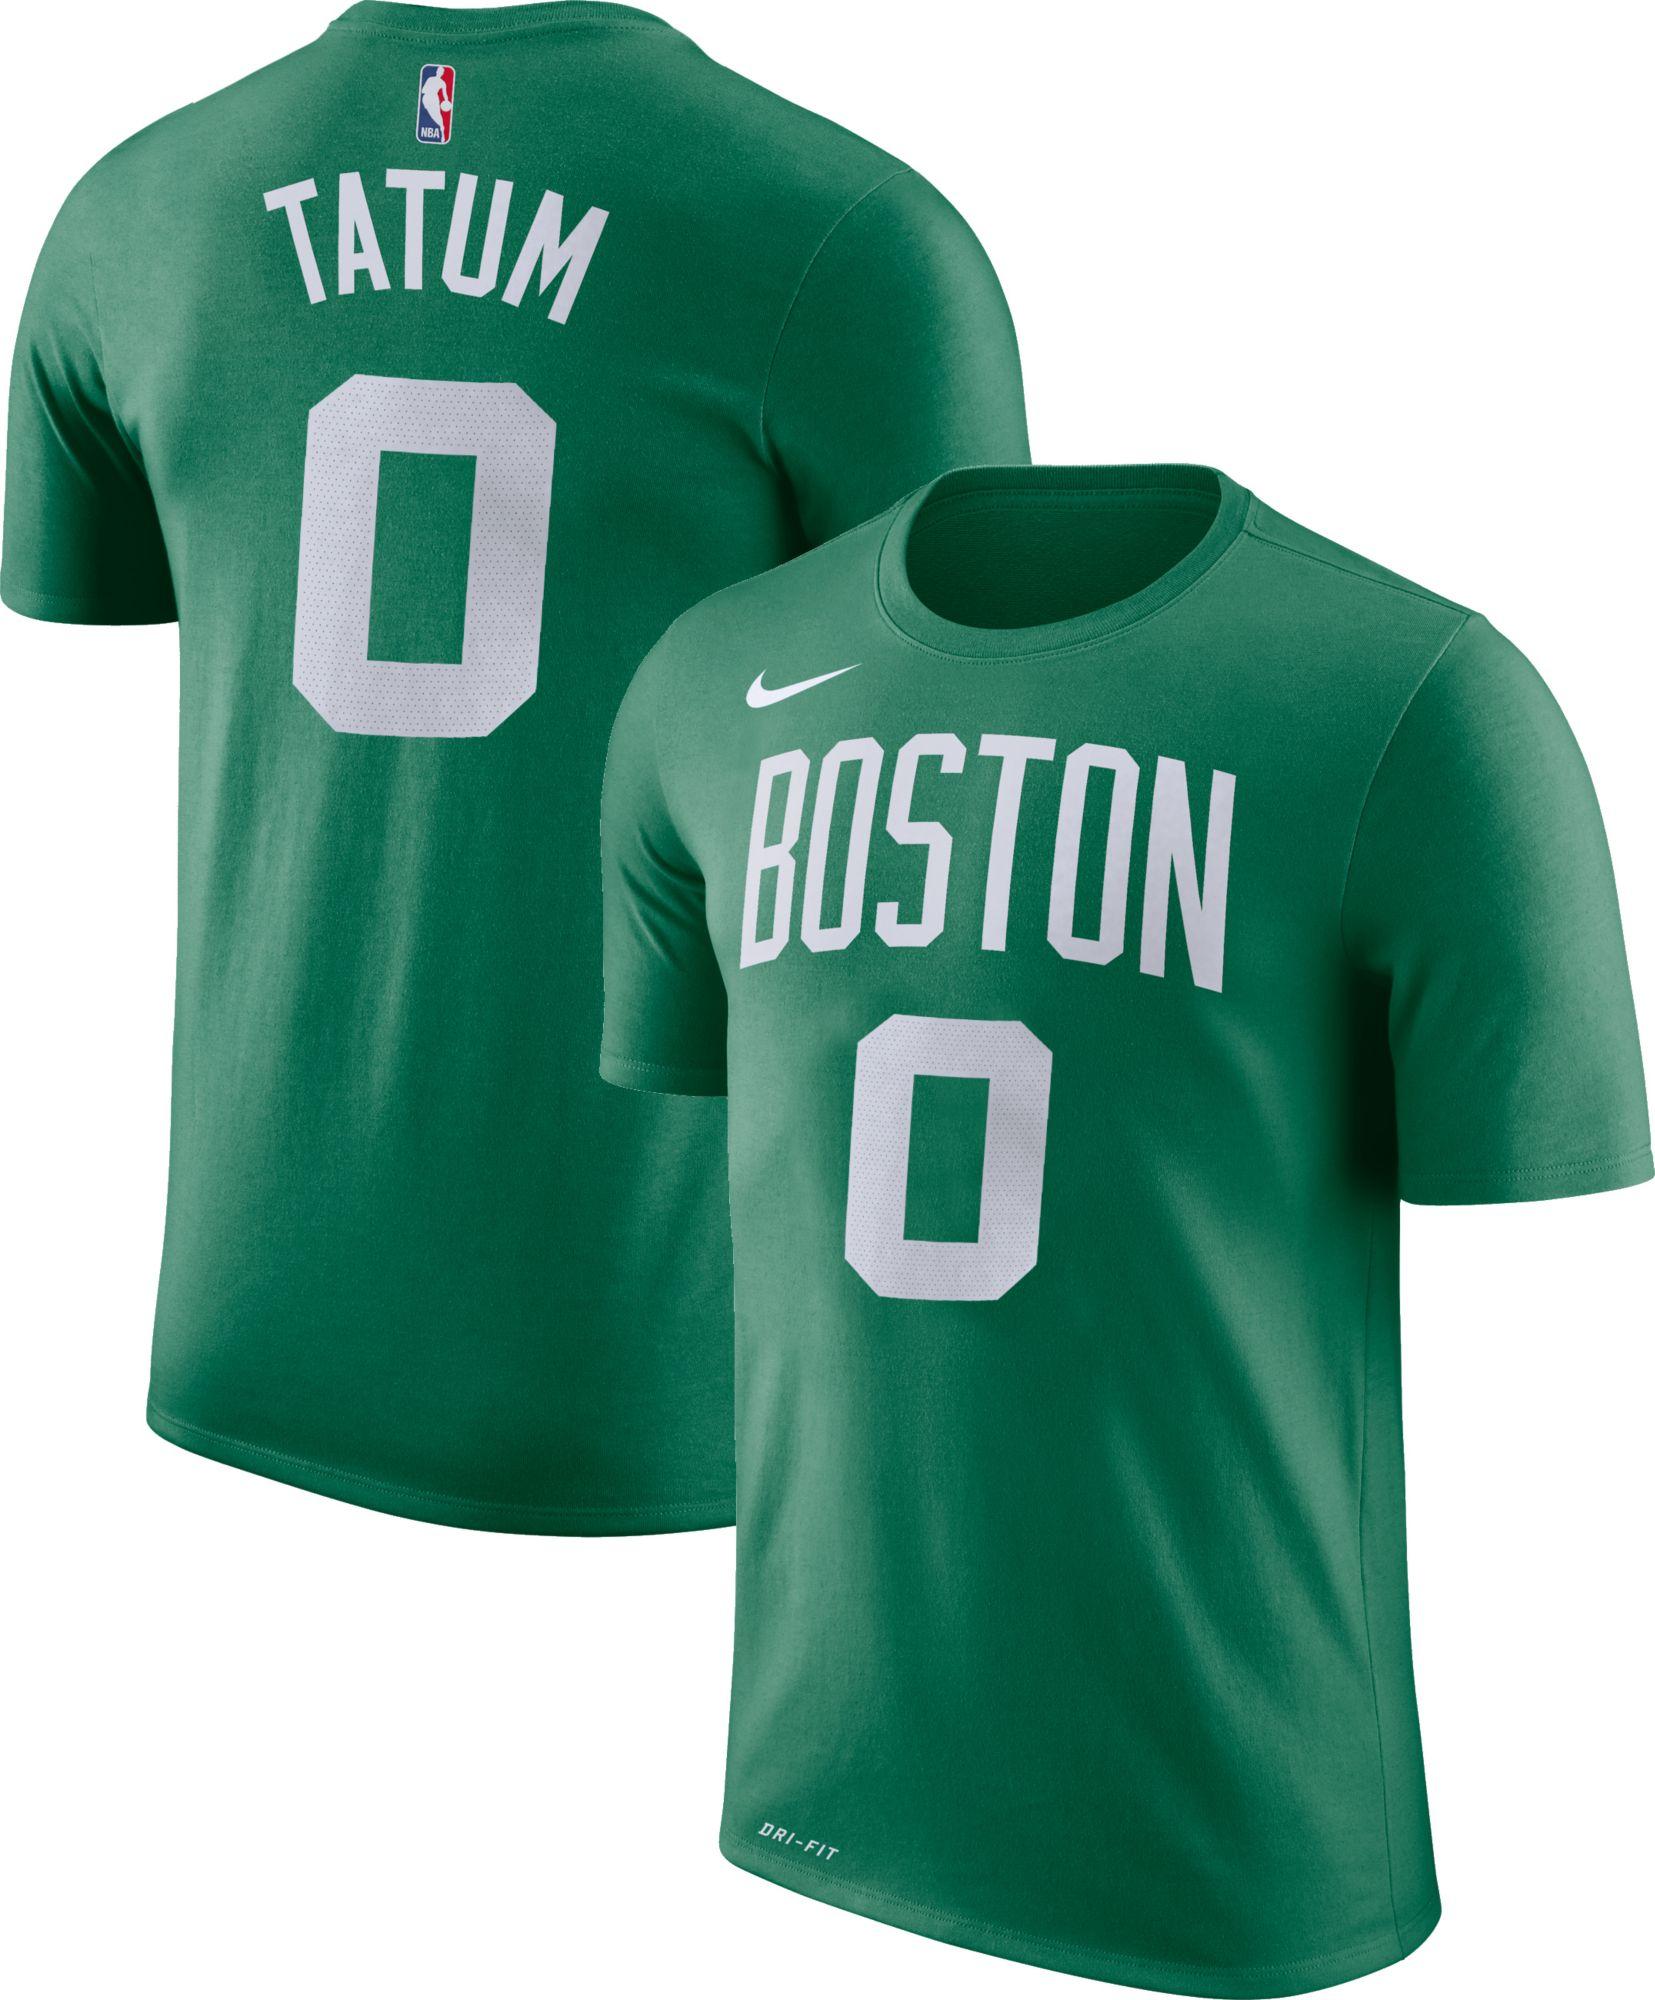 sports shoes 9c112 39f58 jayson-tatum-jersey-shirt